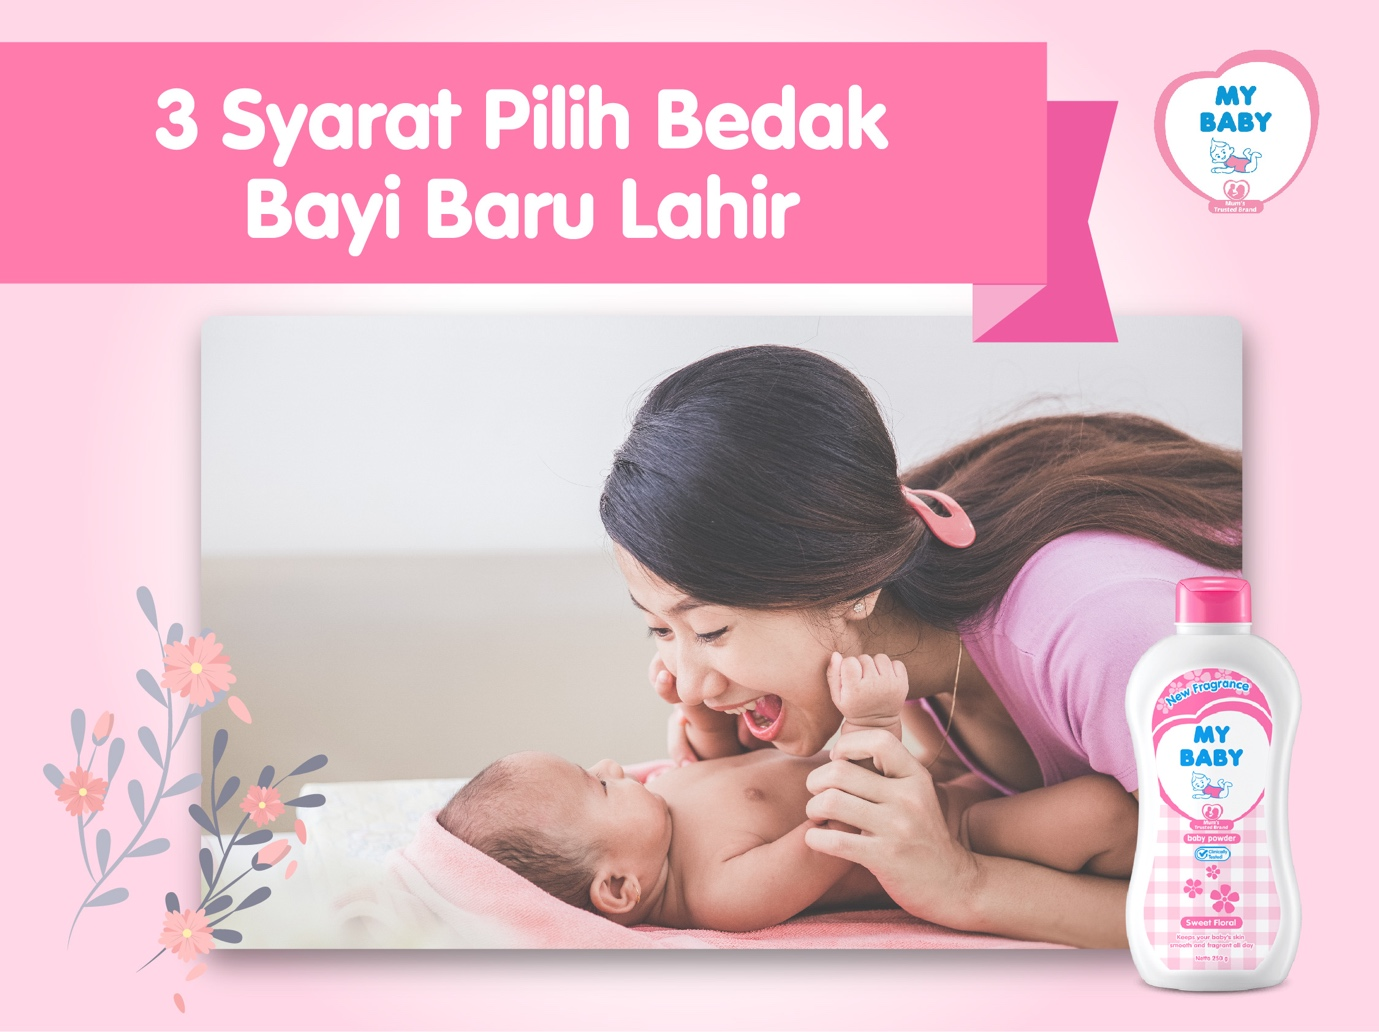 3 Syarat Pilih Bedak Bayi Baru Lahir